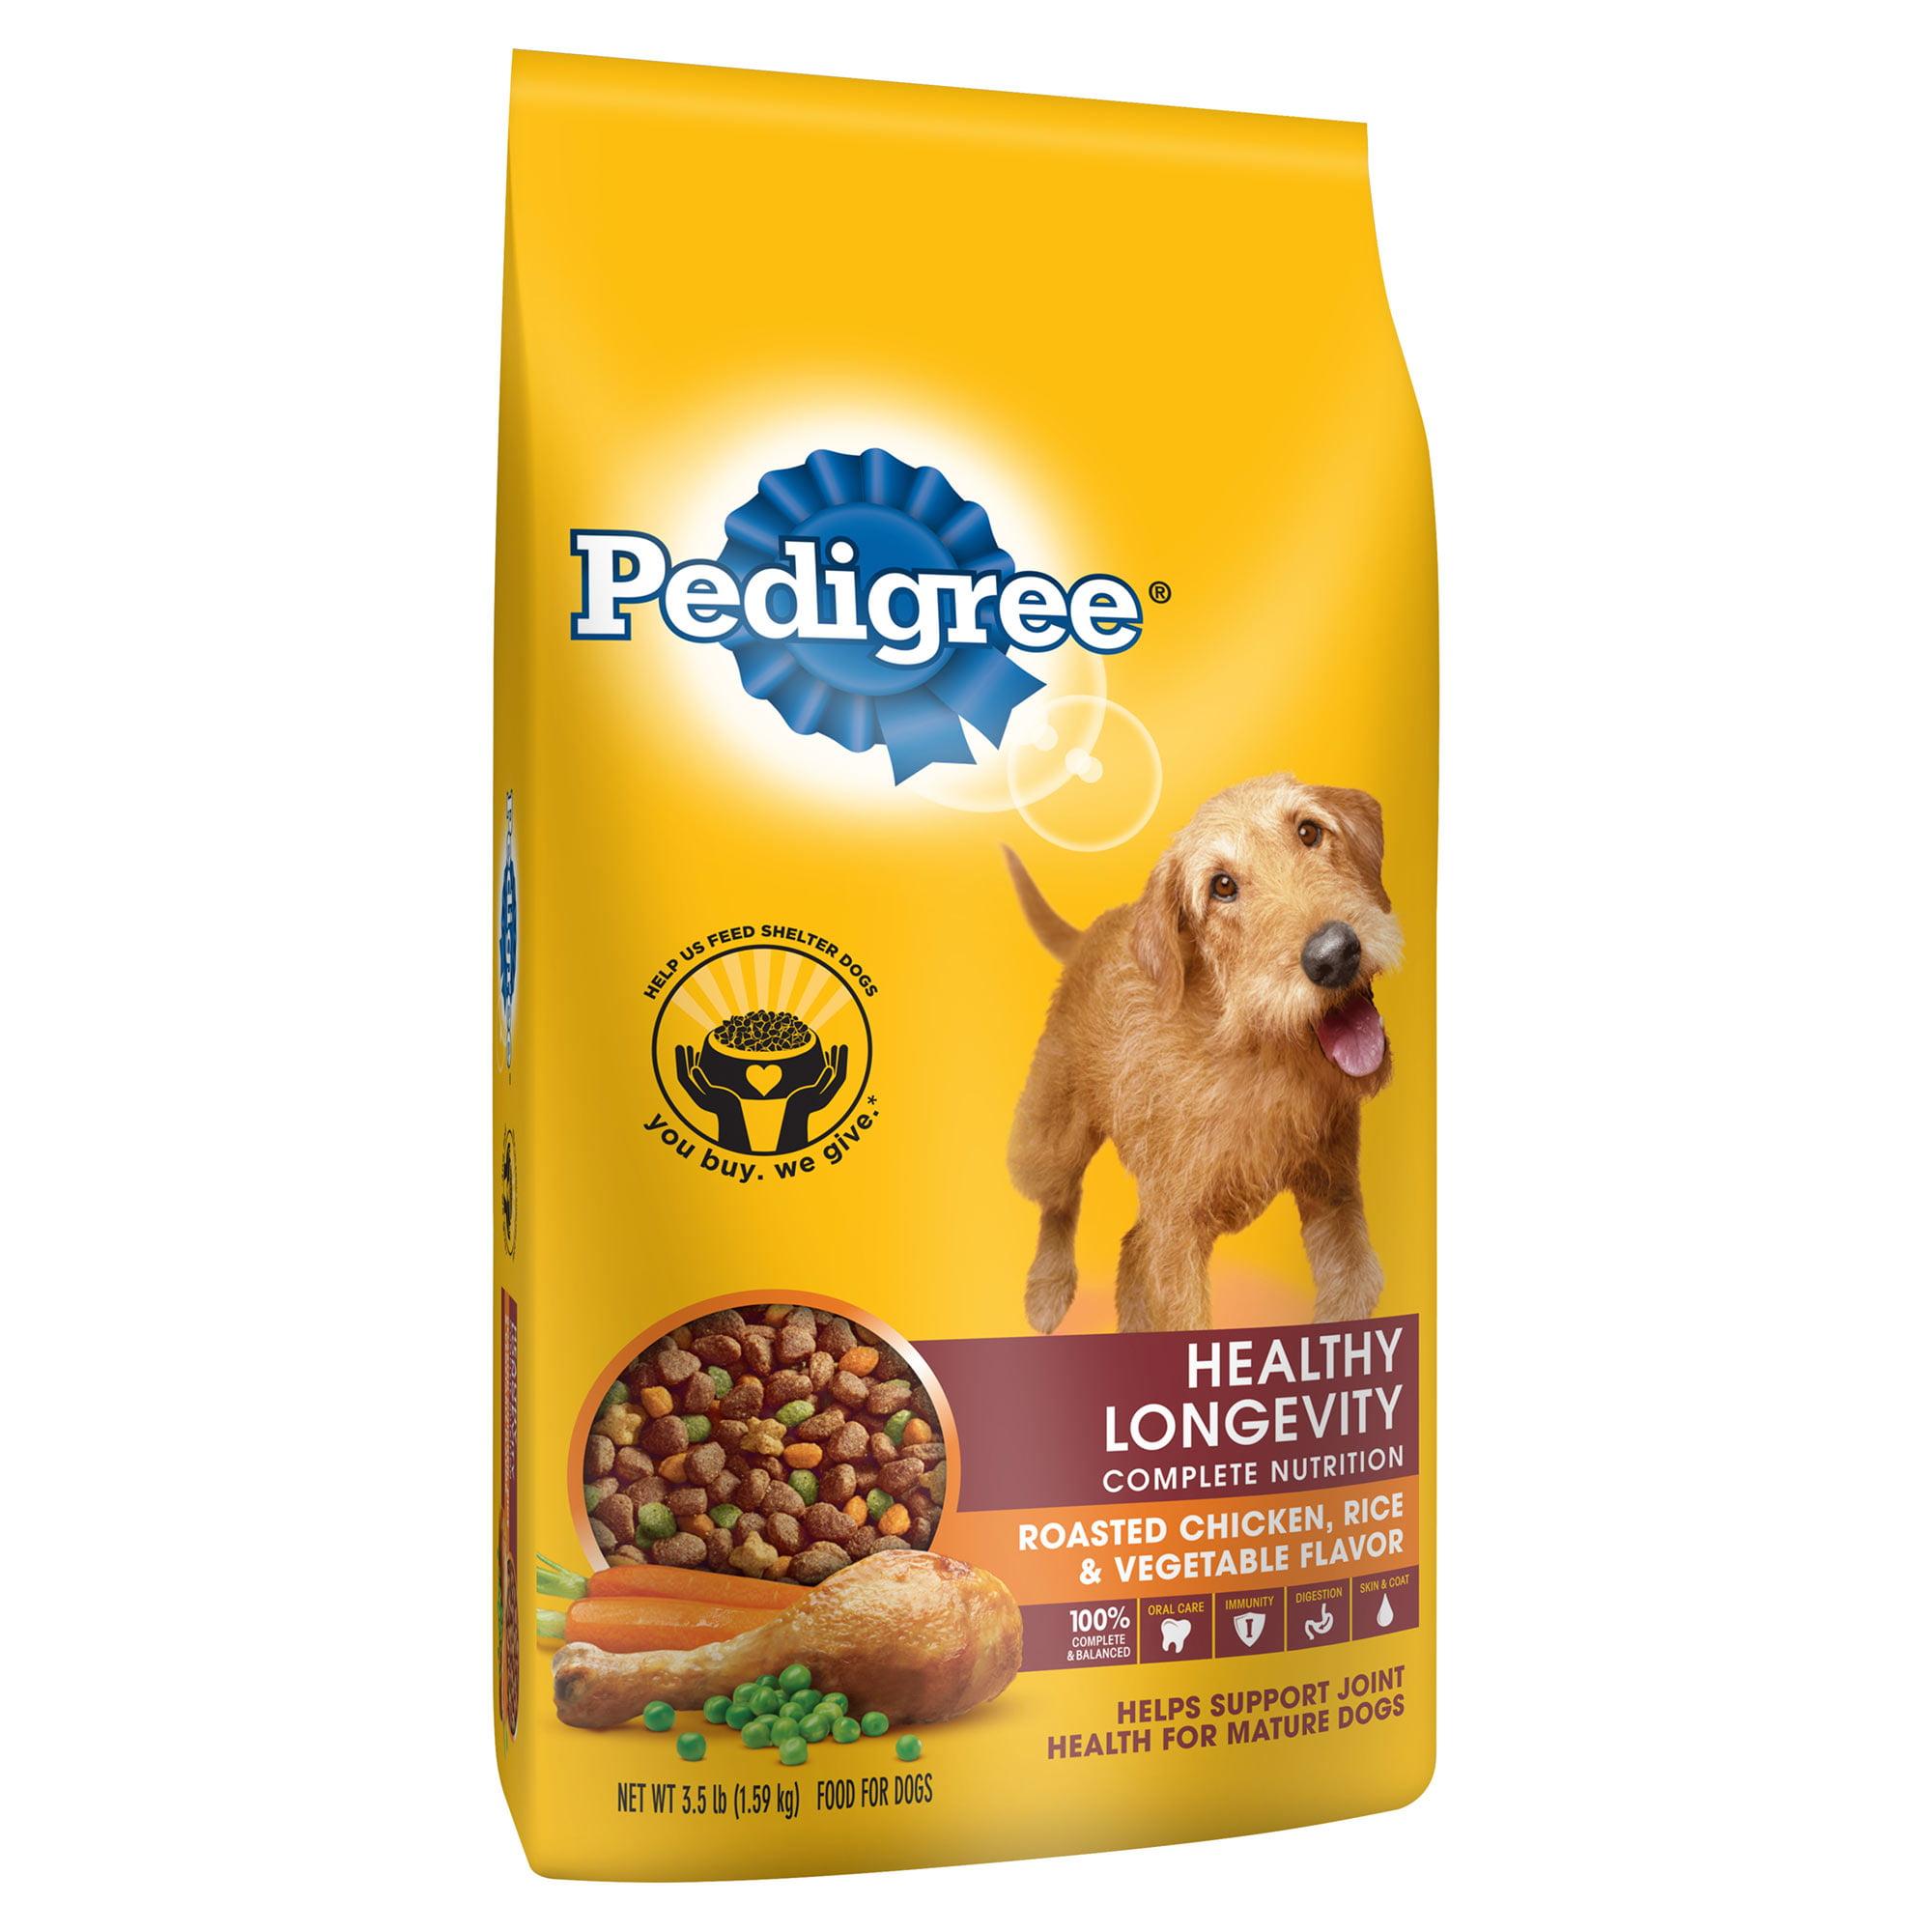 Pedigree Healthy Longevity Targeted Nutrition Chicken Dry Dog Food